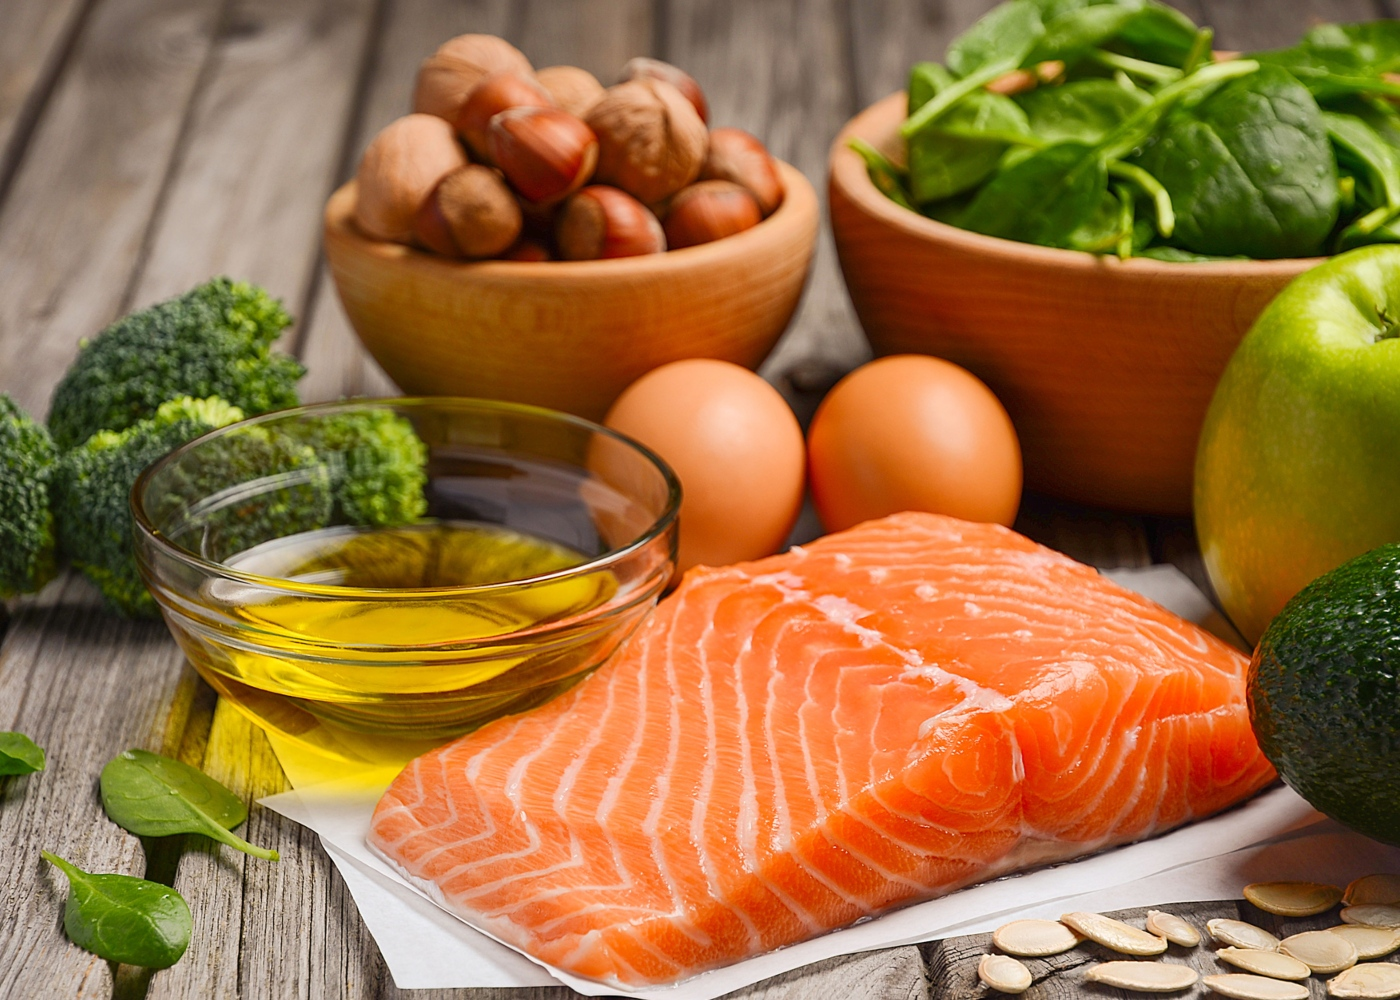 Peixe, ovos e hortícolas para comer menos carne